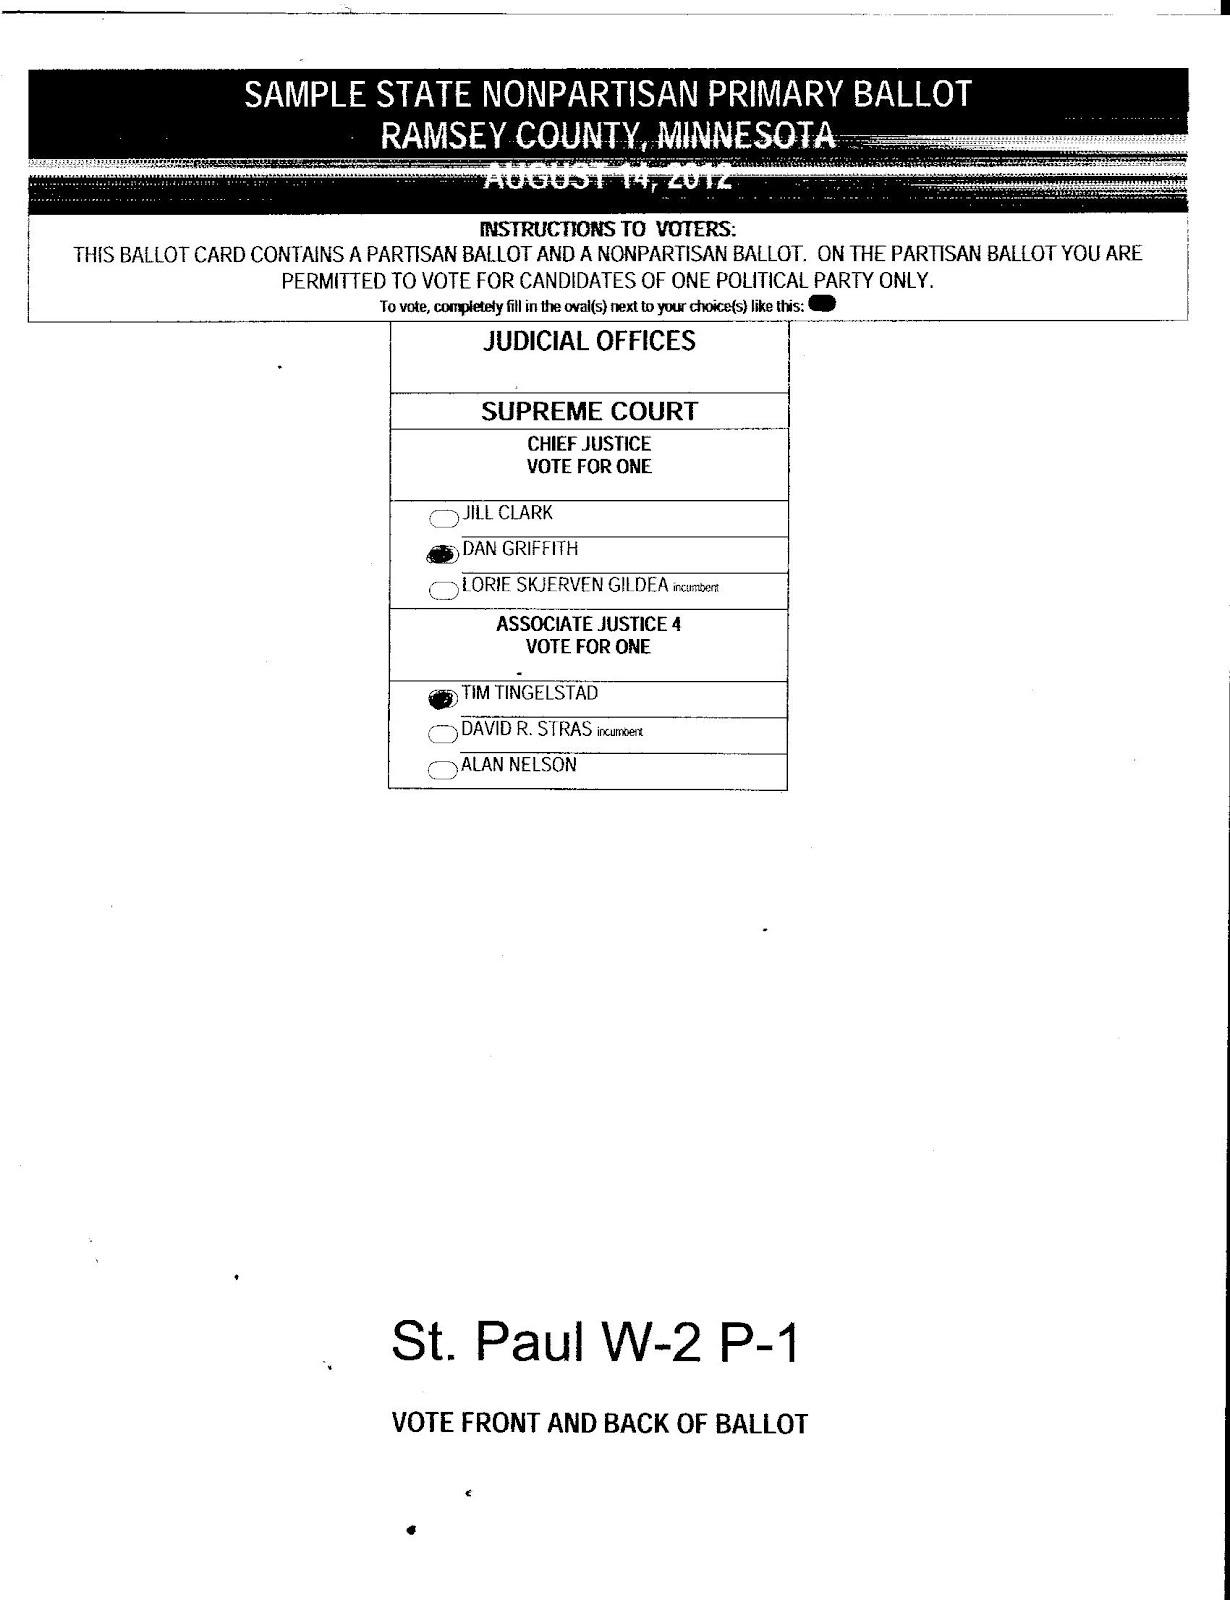 Judicial BallotMNAugPrimary